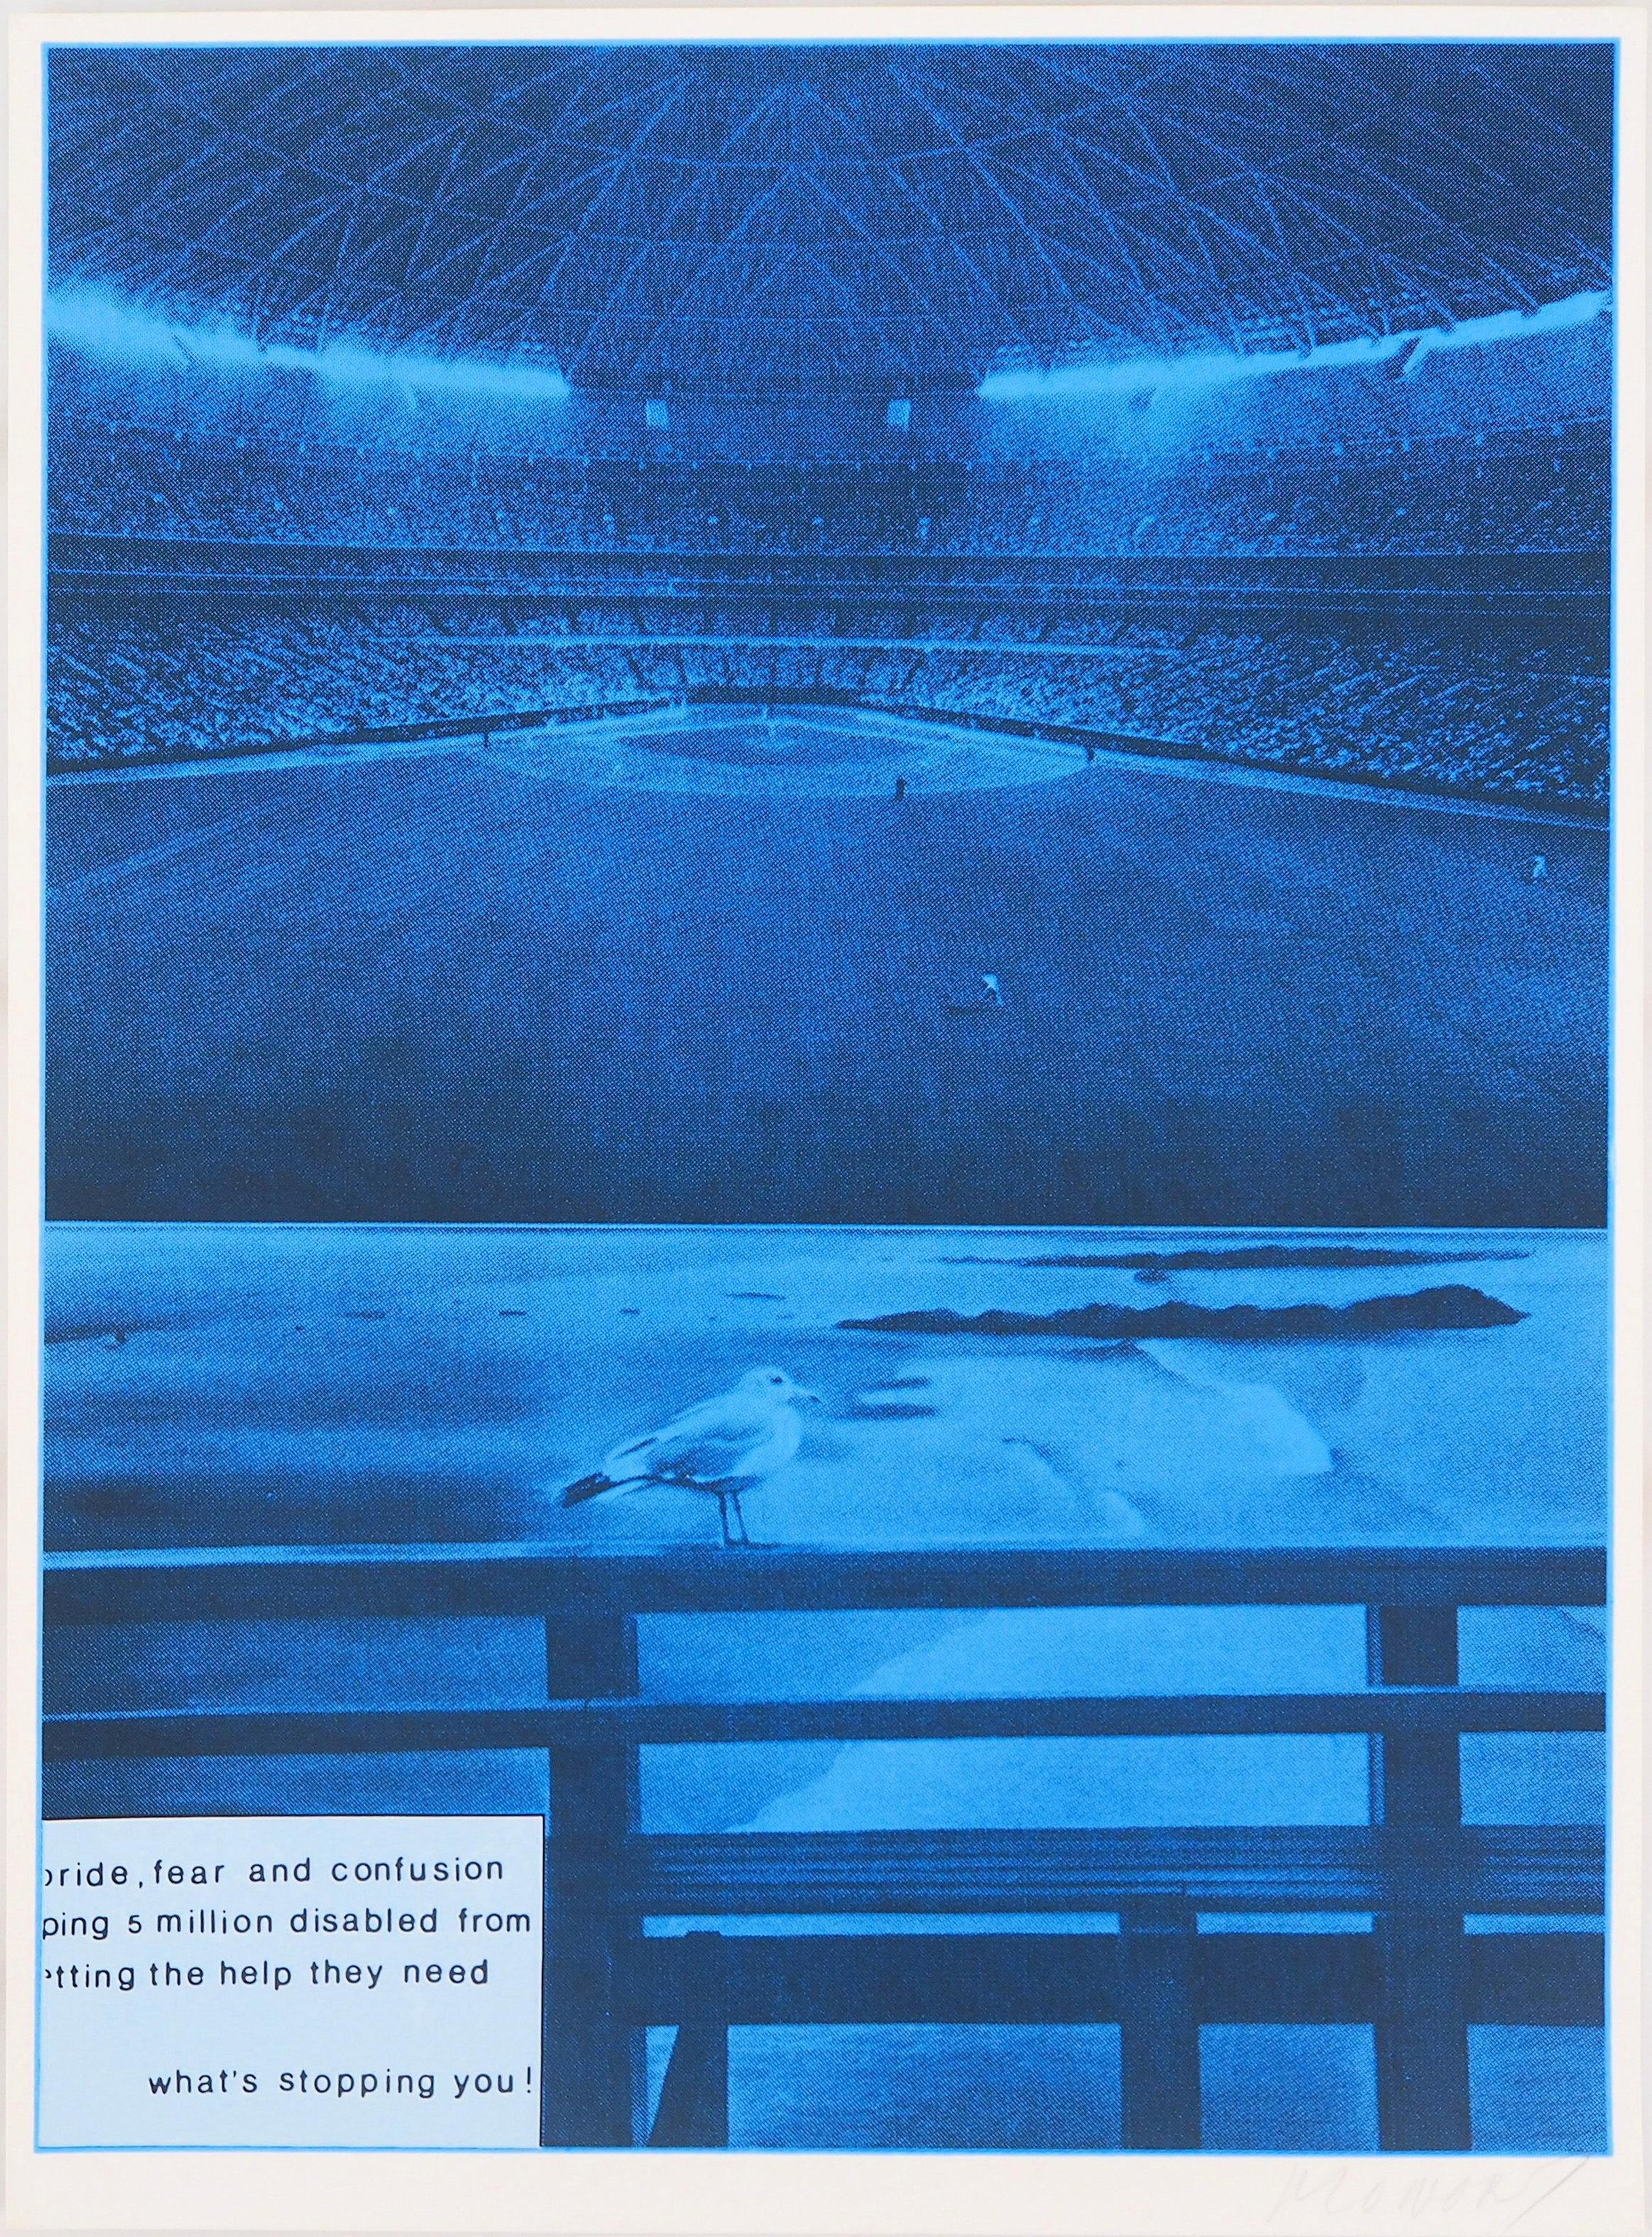 Jacques Monory - (Baseball) Pride, fear and confusion - Original Screenprint